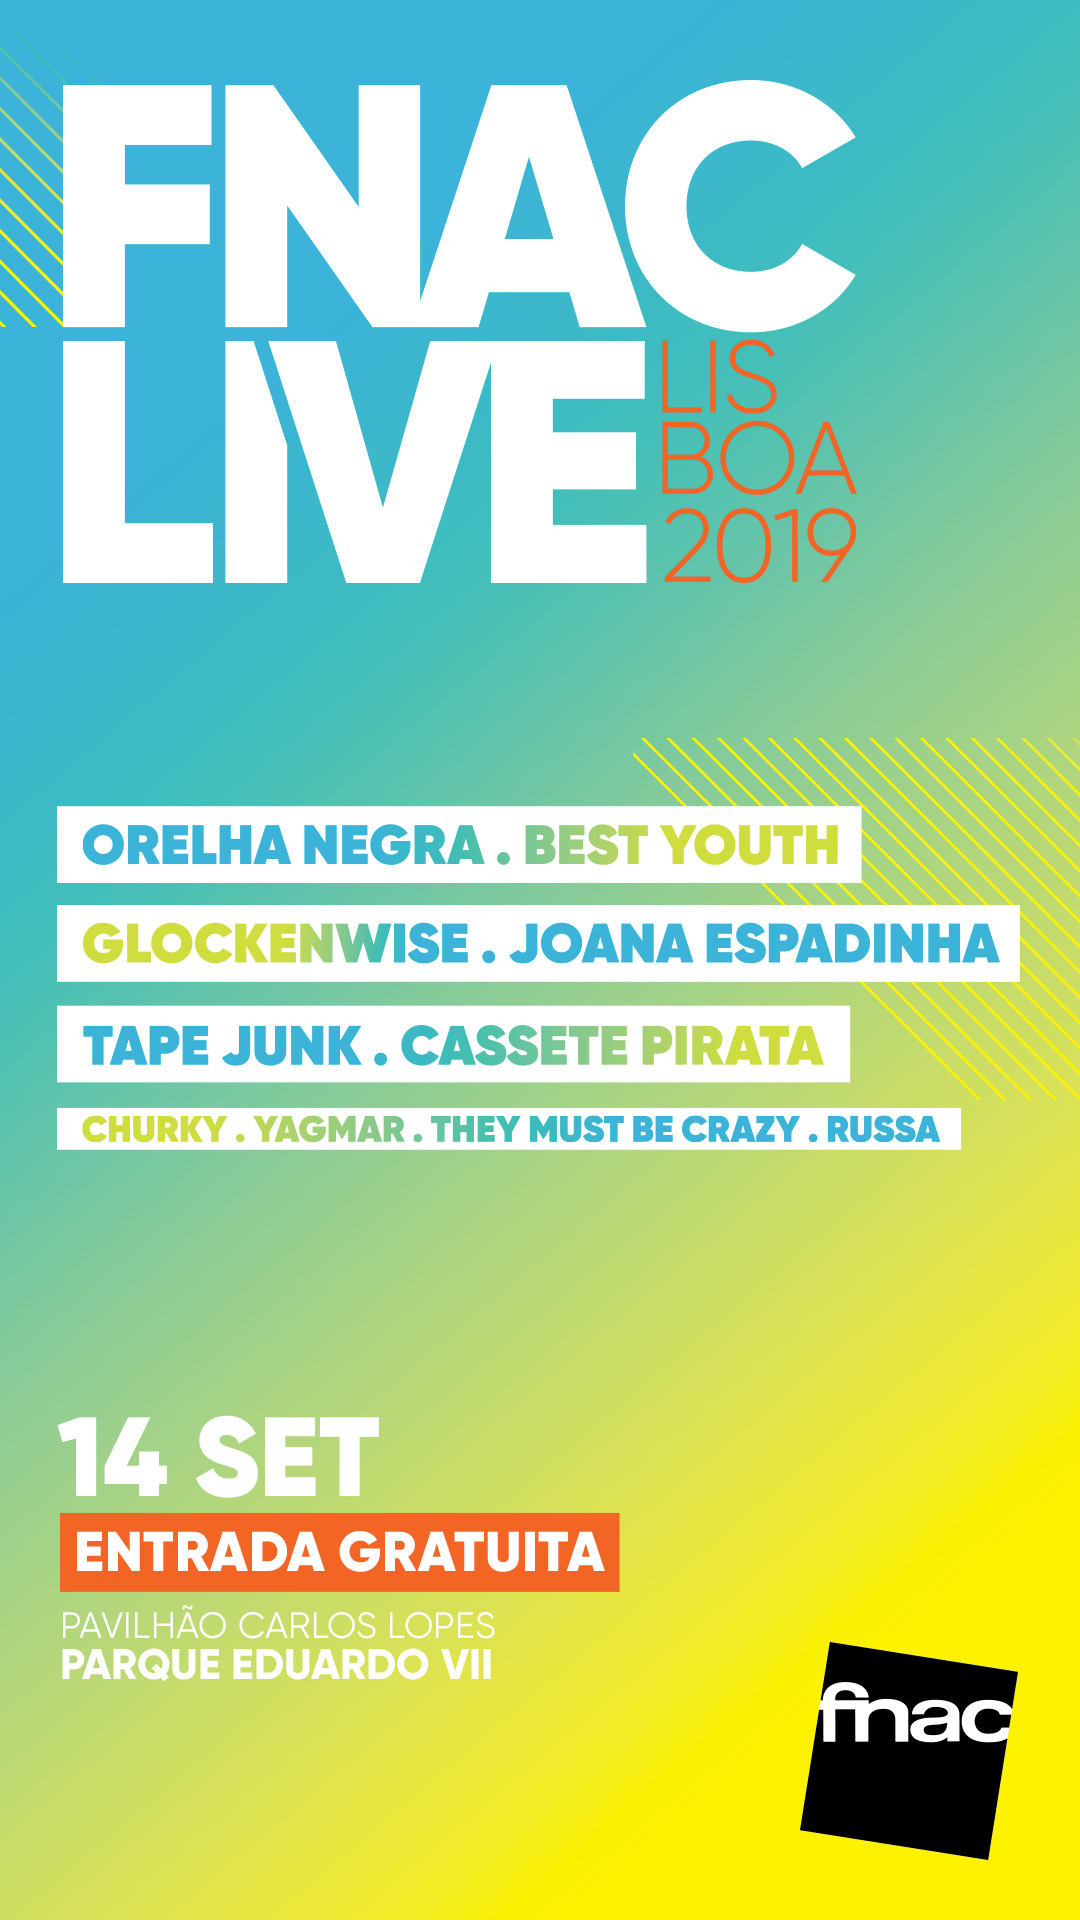 RUSSA @ FNAC LIVE 19